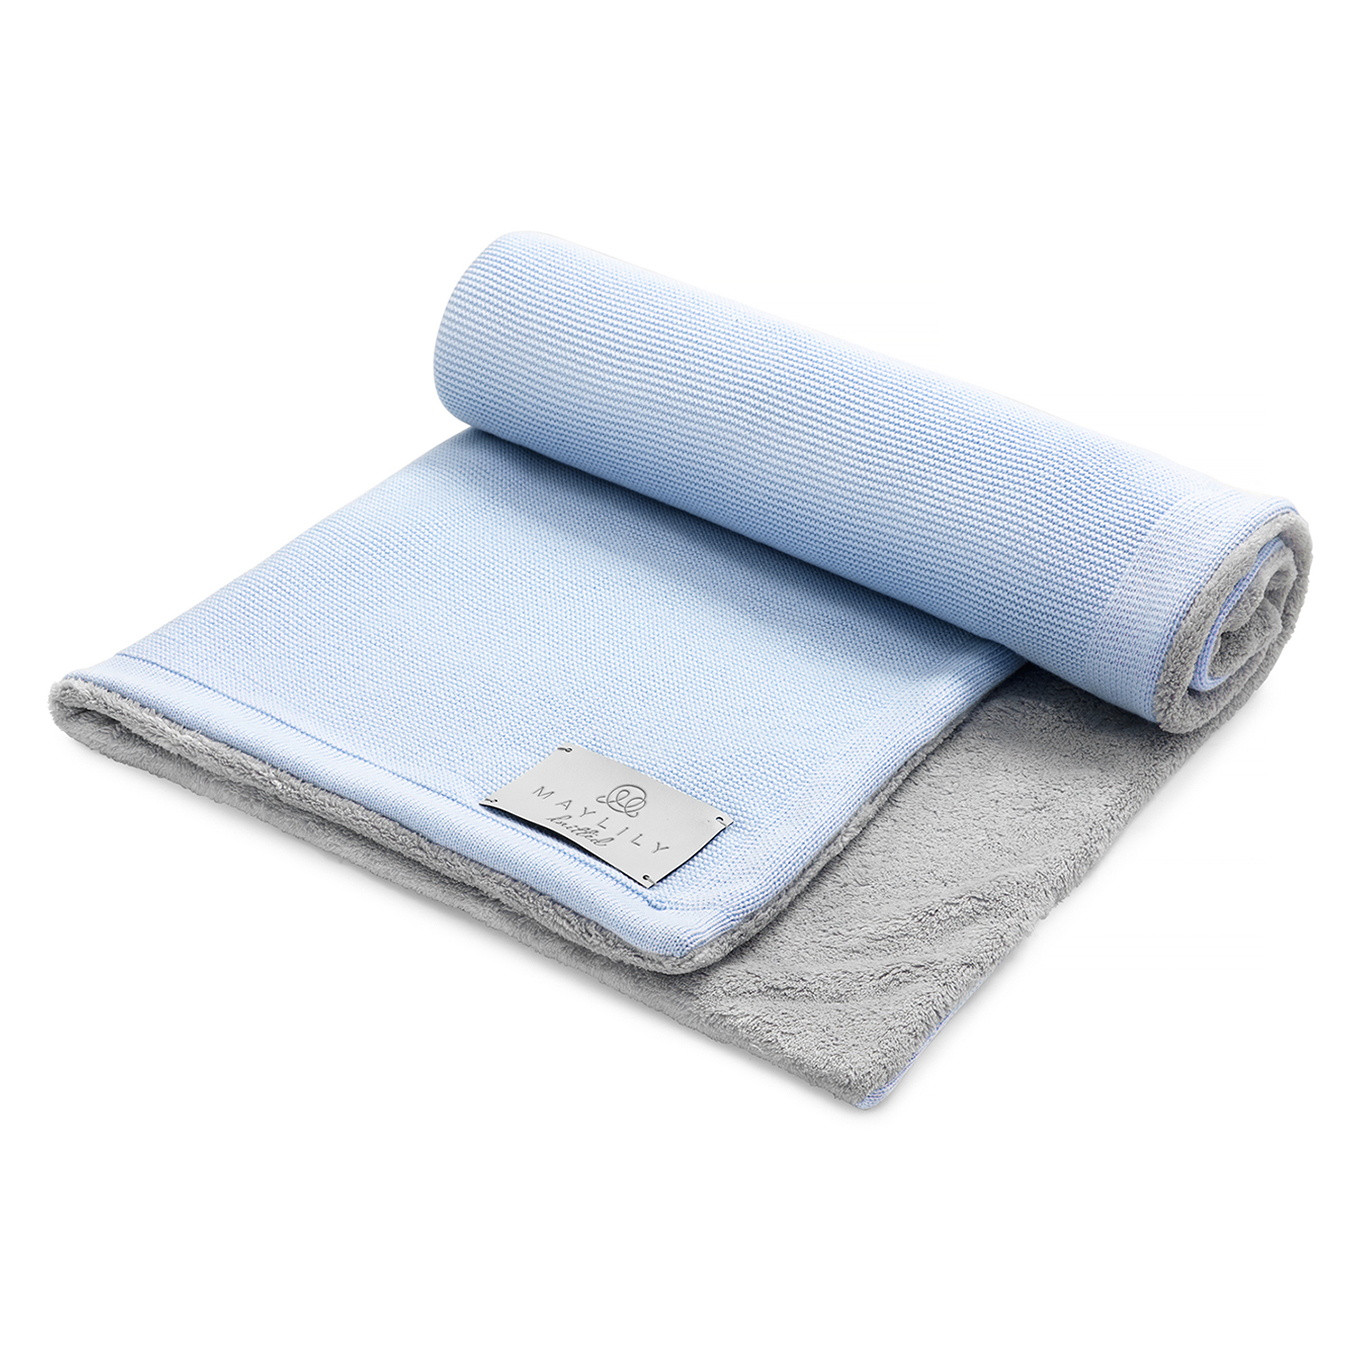 Bamboolove Winter blanket XL Blue